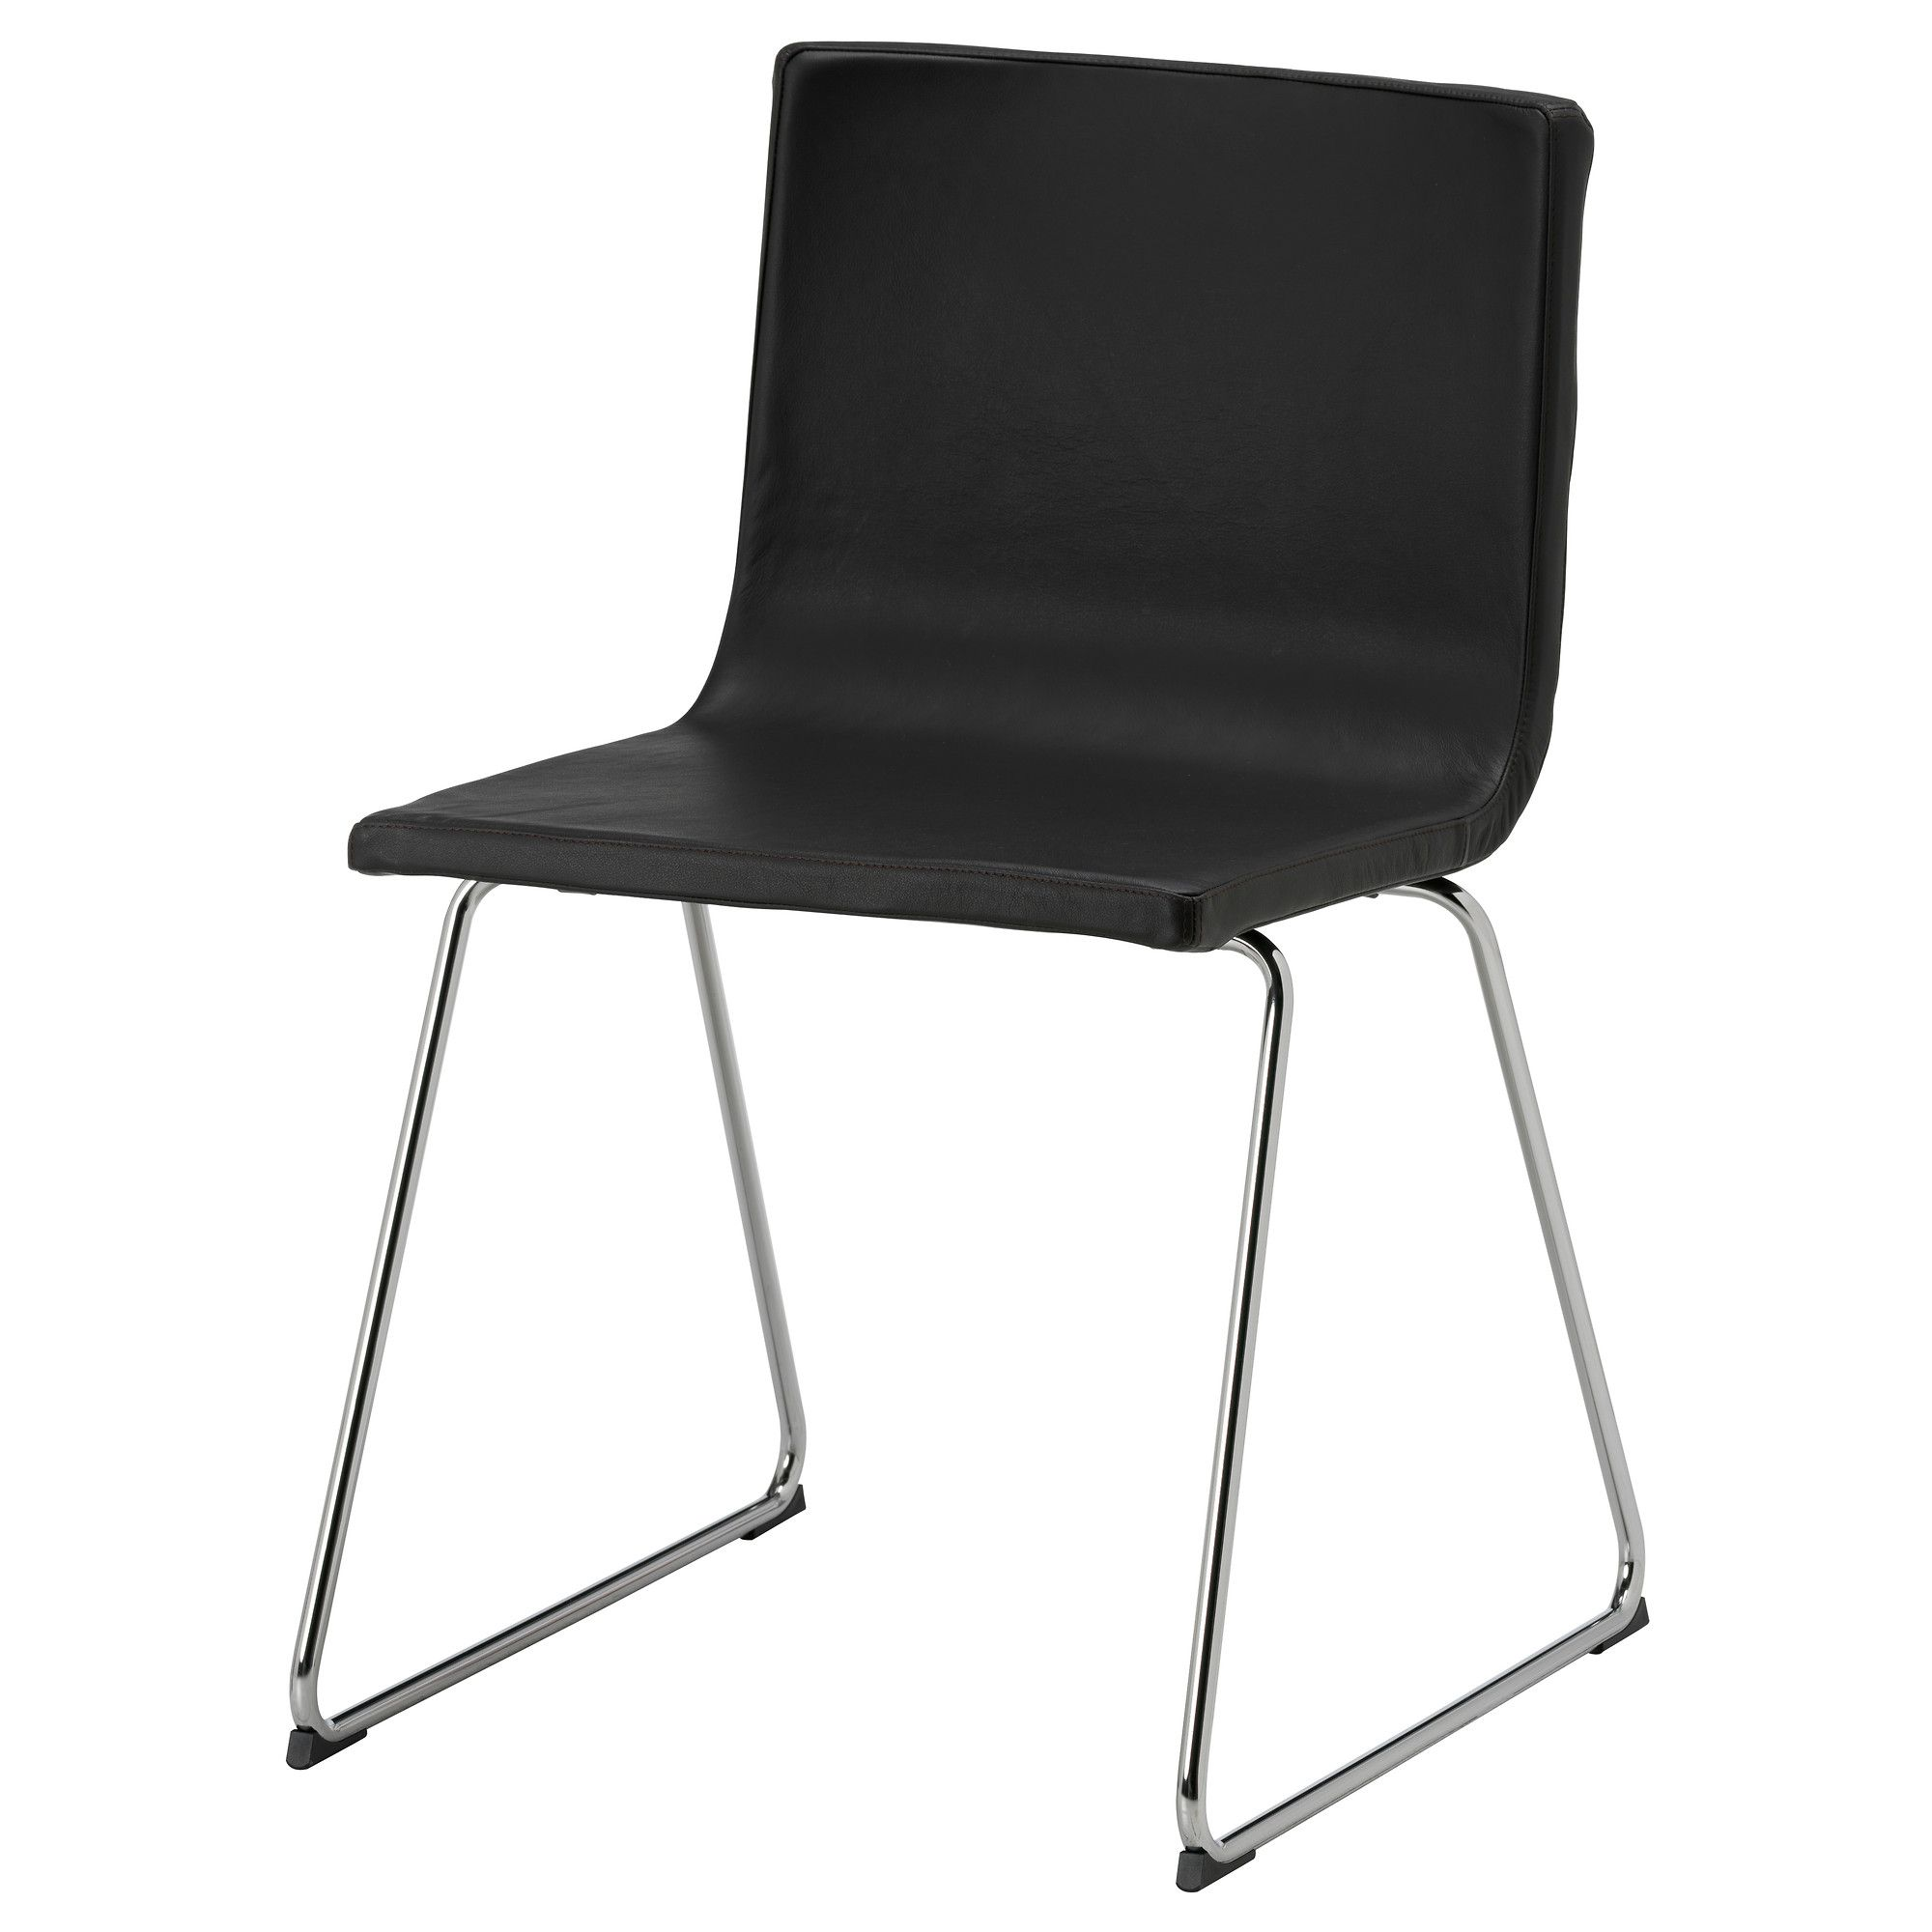 bernhard chair chrome plated kavat mjuk dark brown ugh bleh interior design pinterest. Black Bedroom Furniture Sets. Home Design Ideas